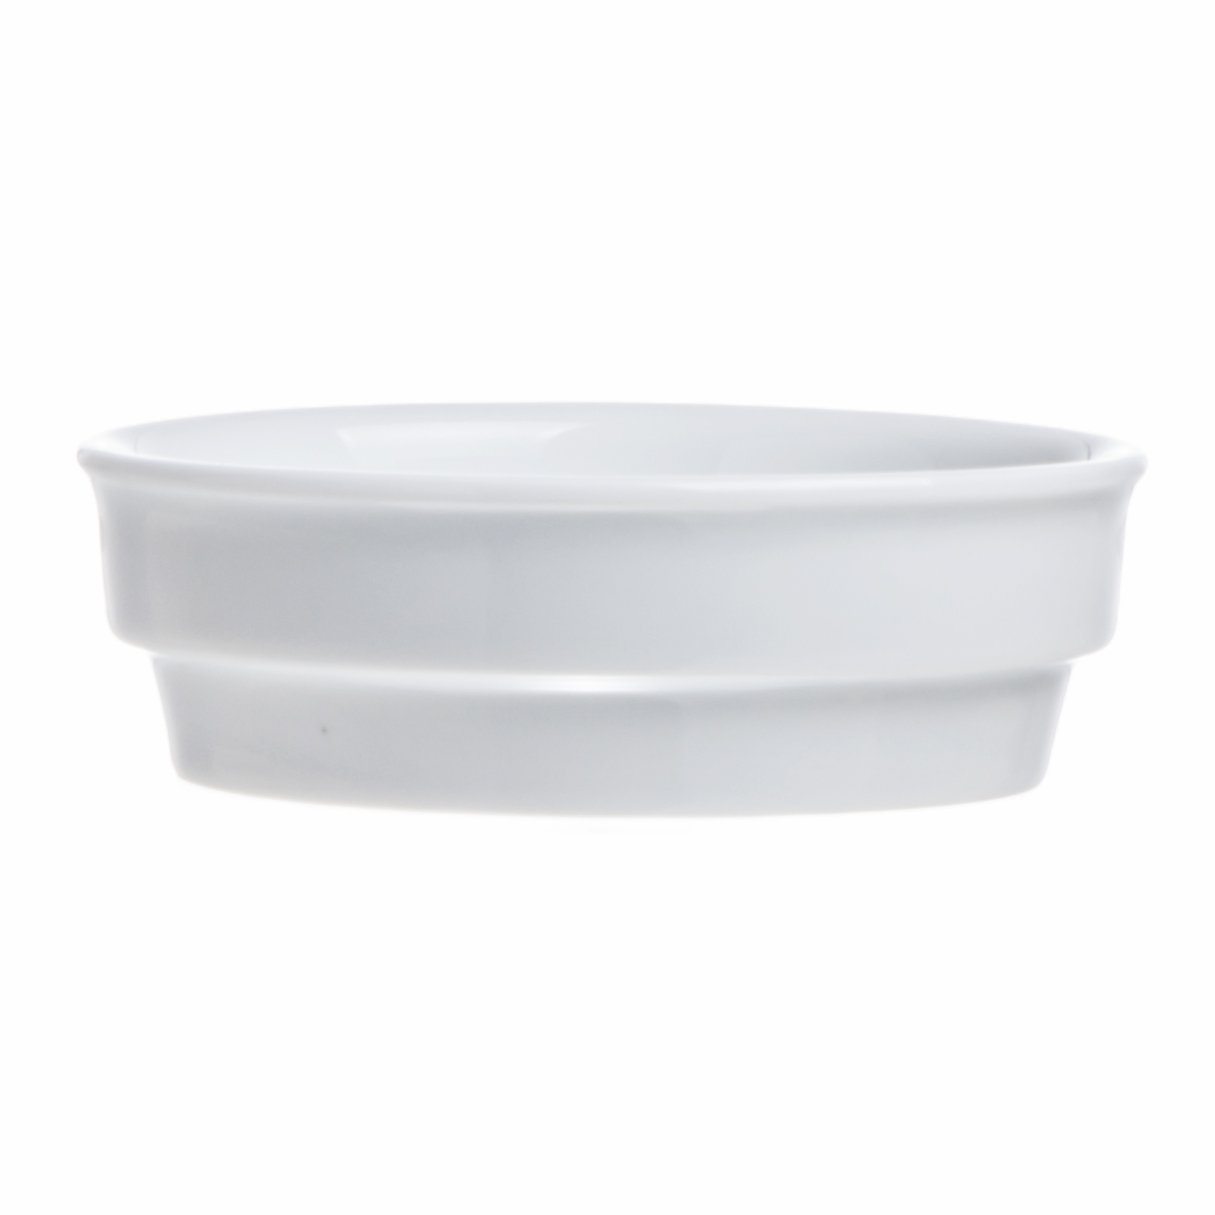 STACKABLE 6.7 Oz. Serving Bowls for Snack, Appetizer, Salad, Dips, Desserts, Ice Cream - White Porcelain, Restaurant&Hotel Quality (6)